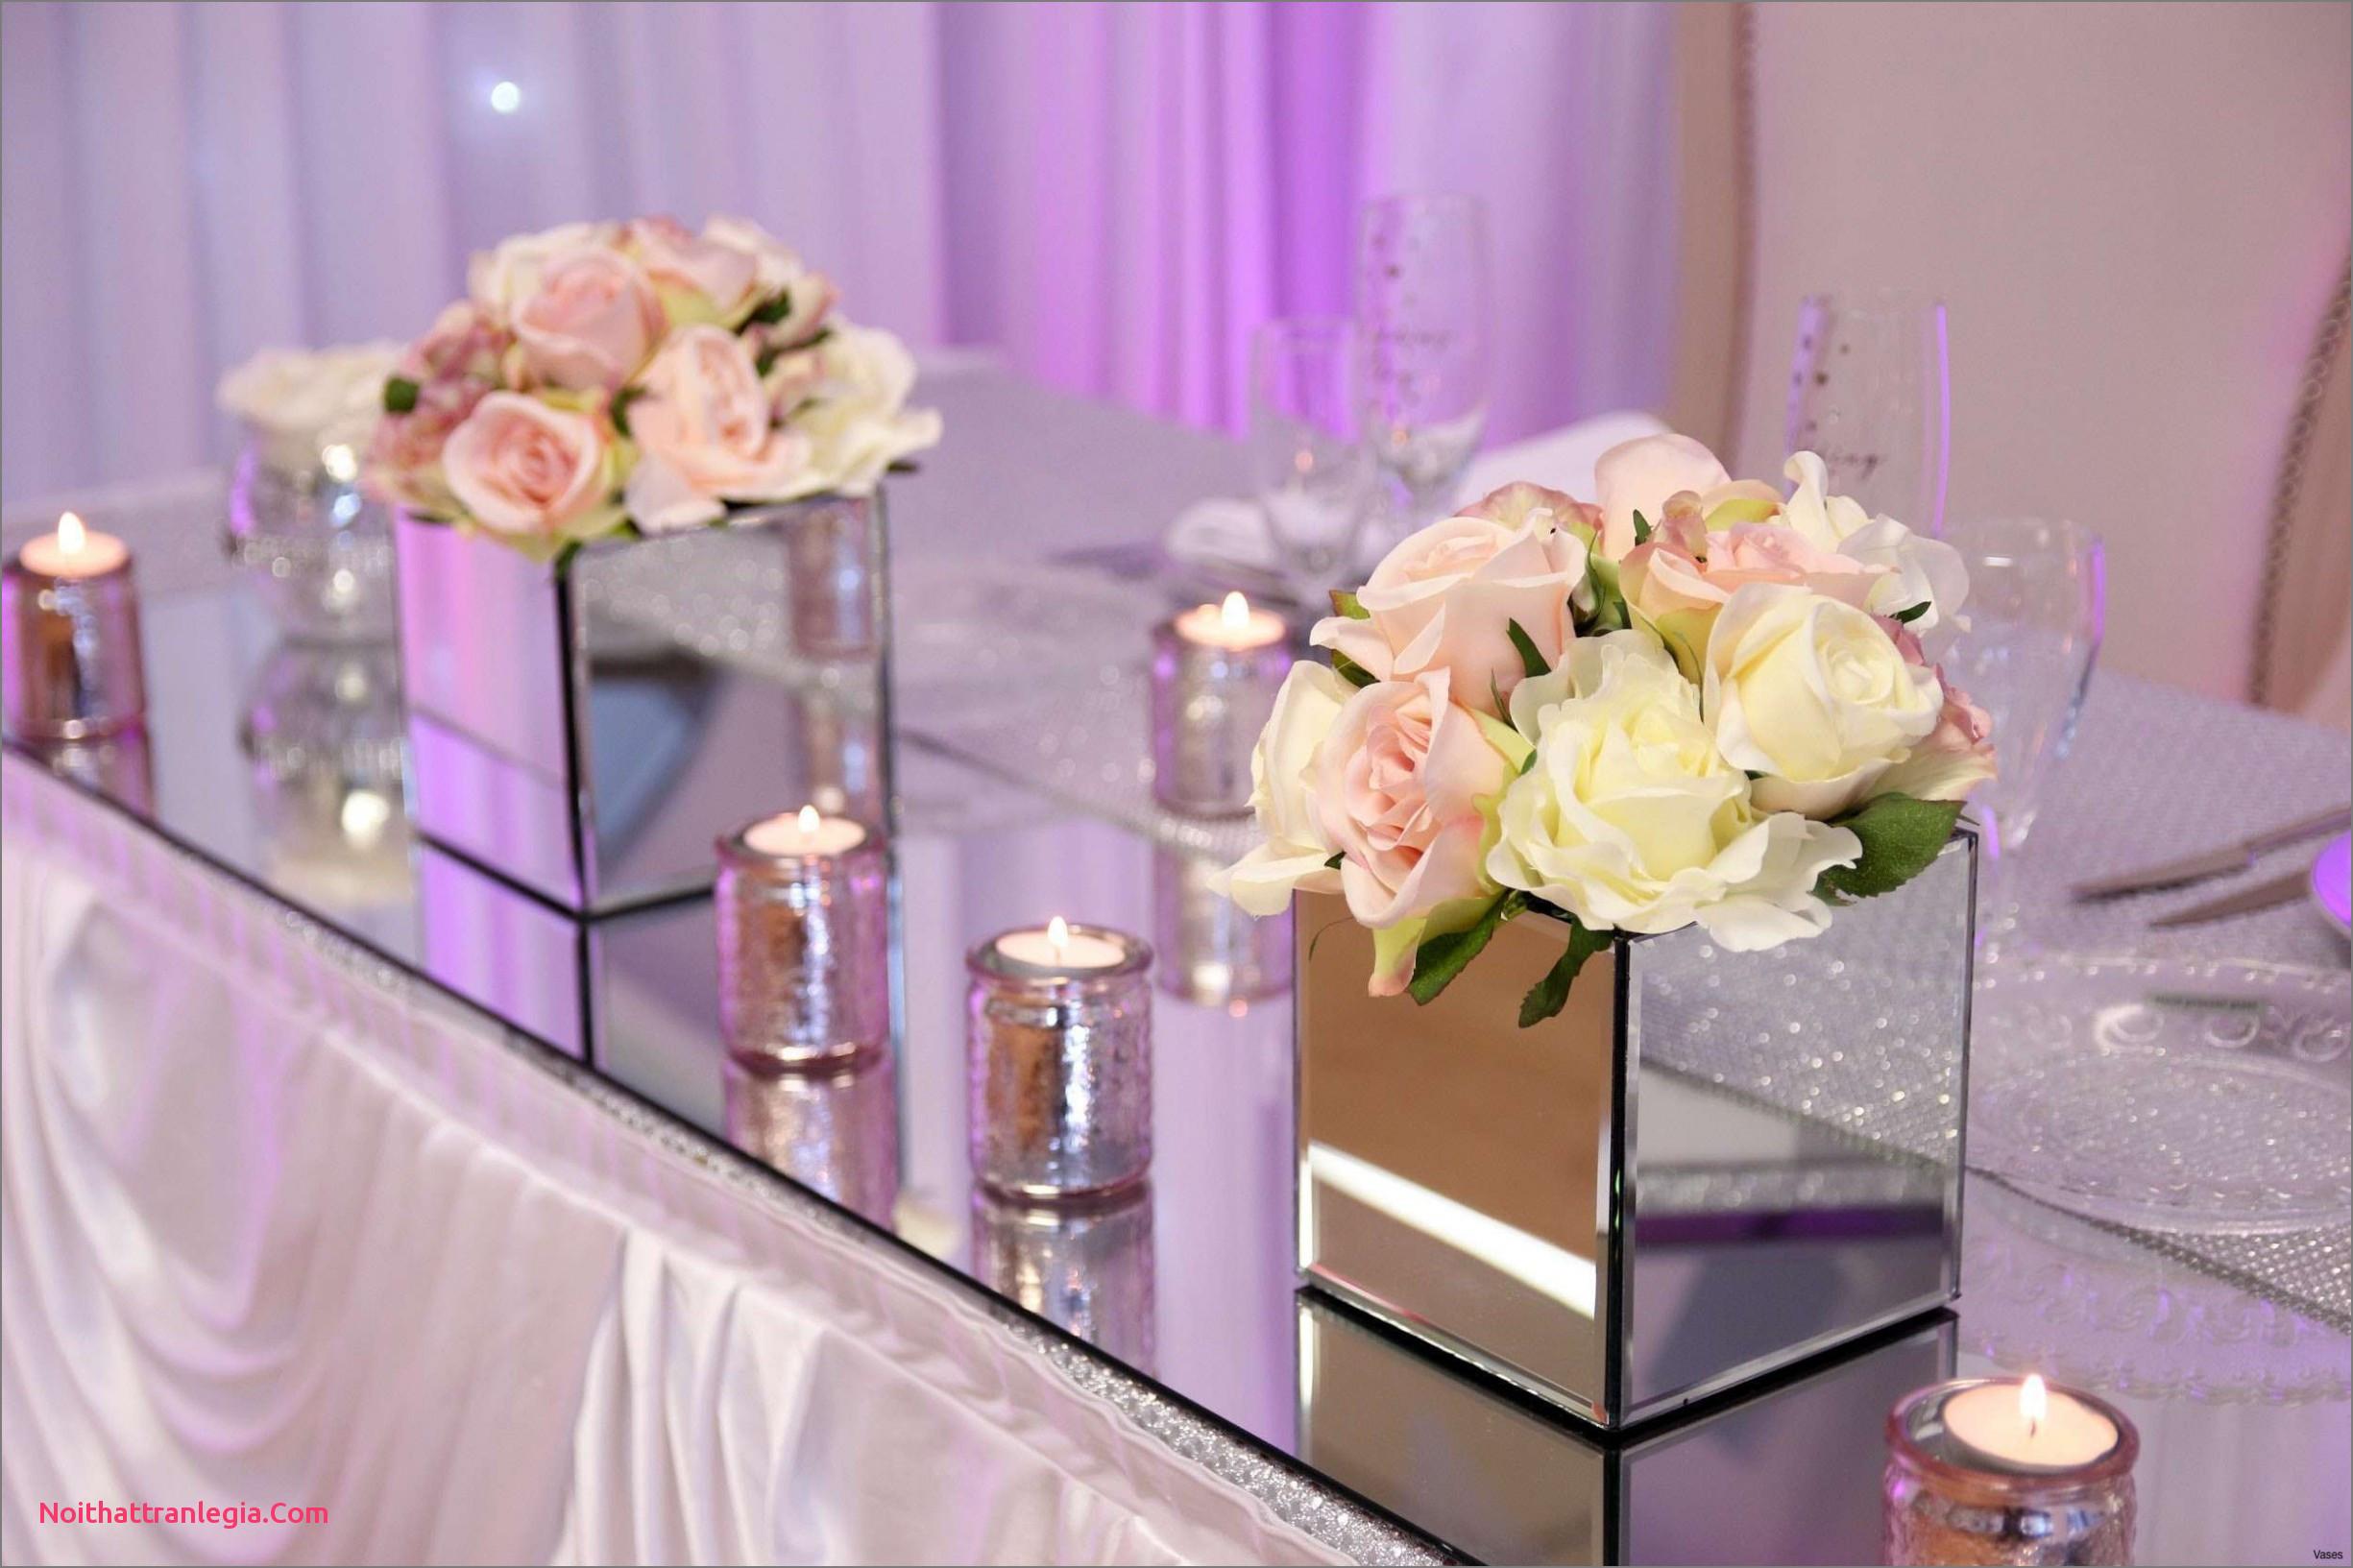 silver vases bulk of 20 wedding vases noithattranlegia vases design in mirrored square vase 3h vases mirror table decorationi 0d weddings